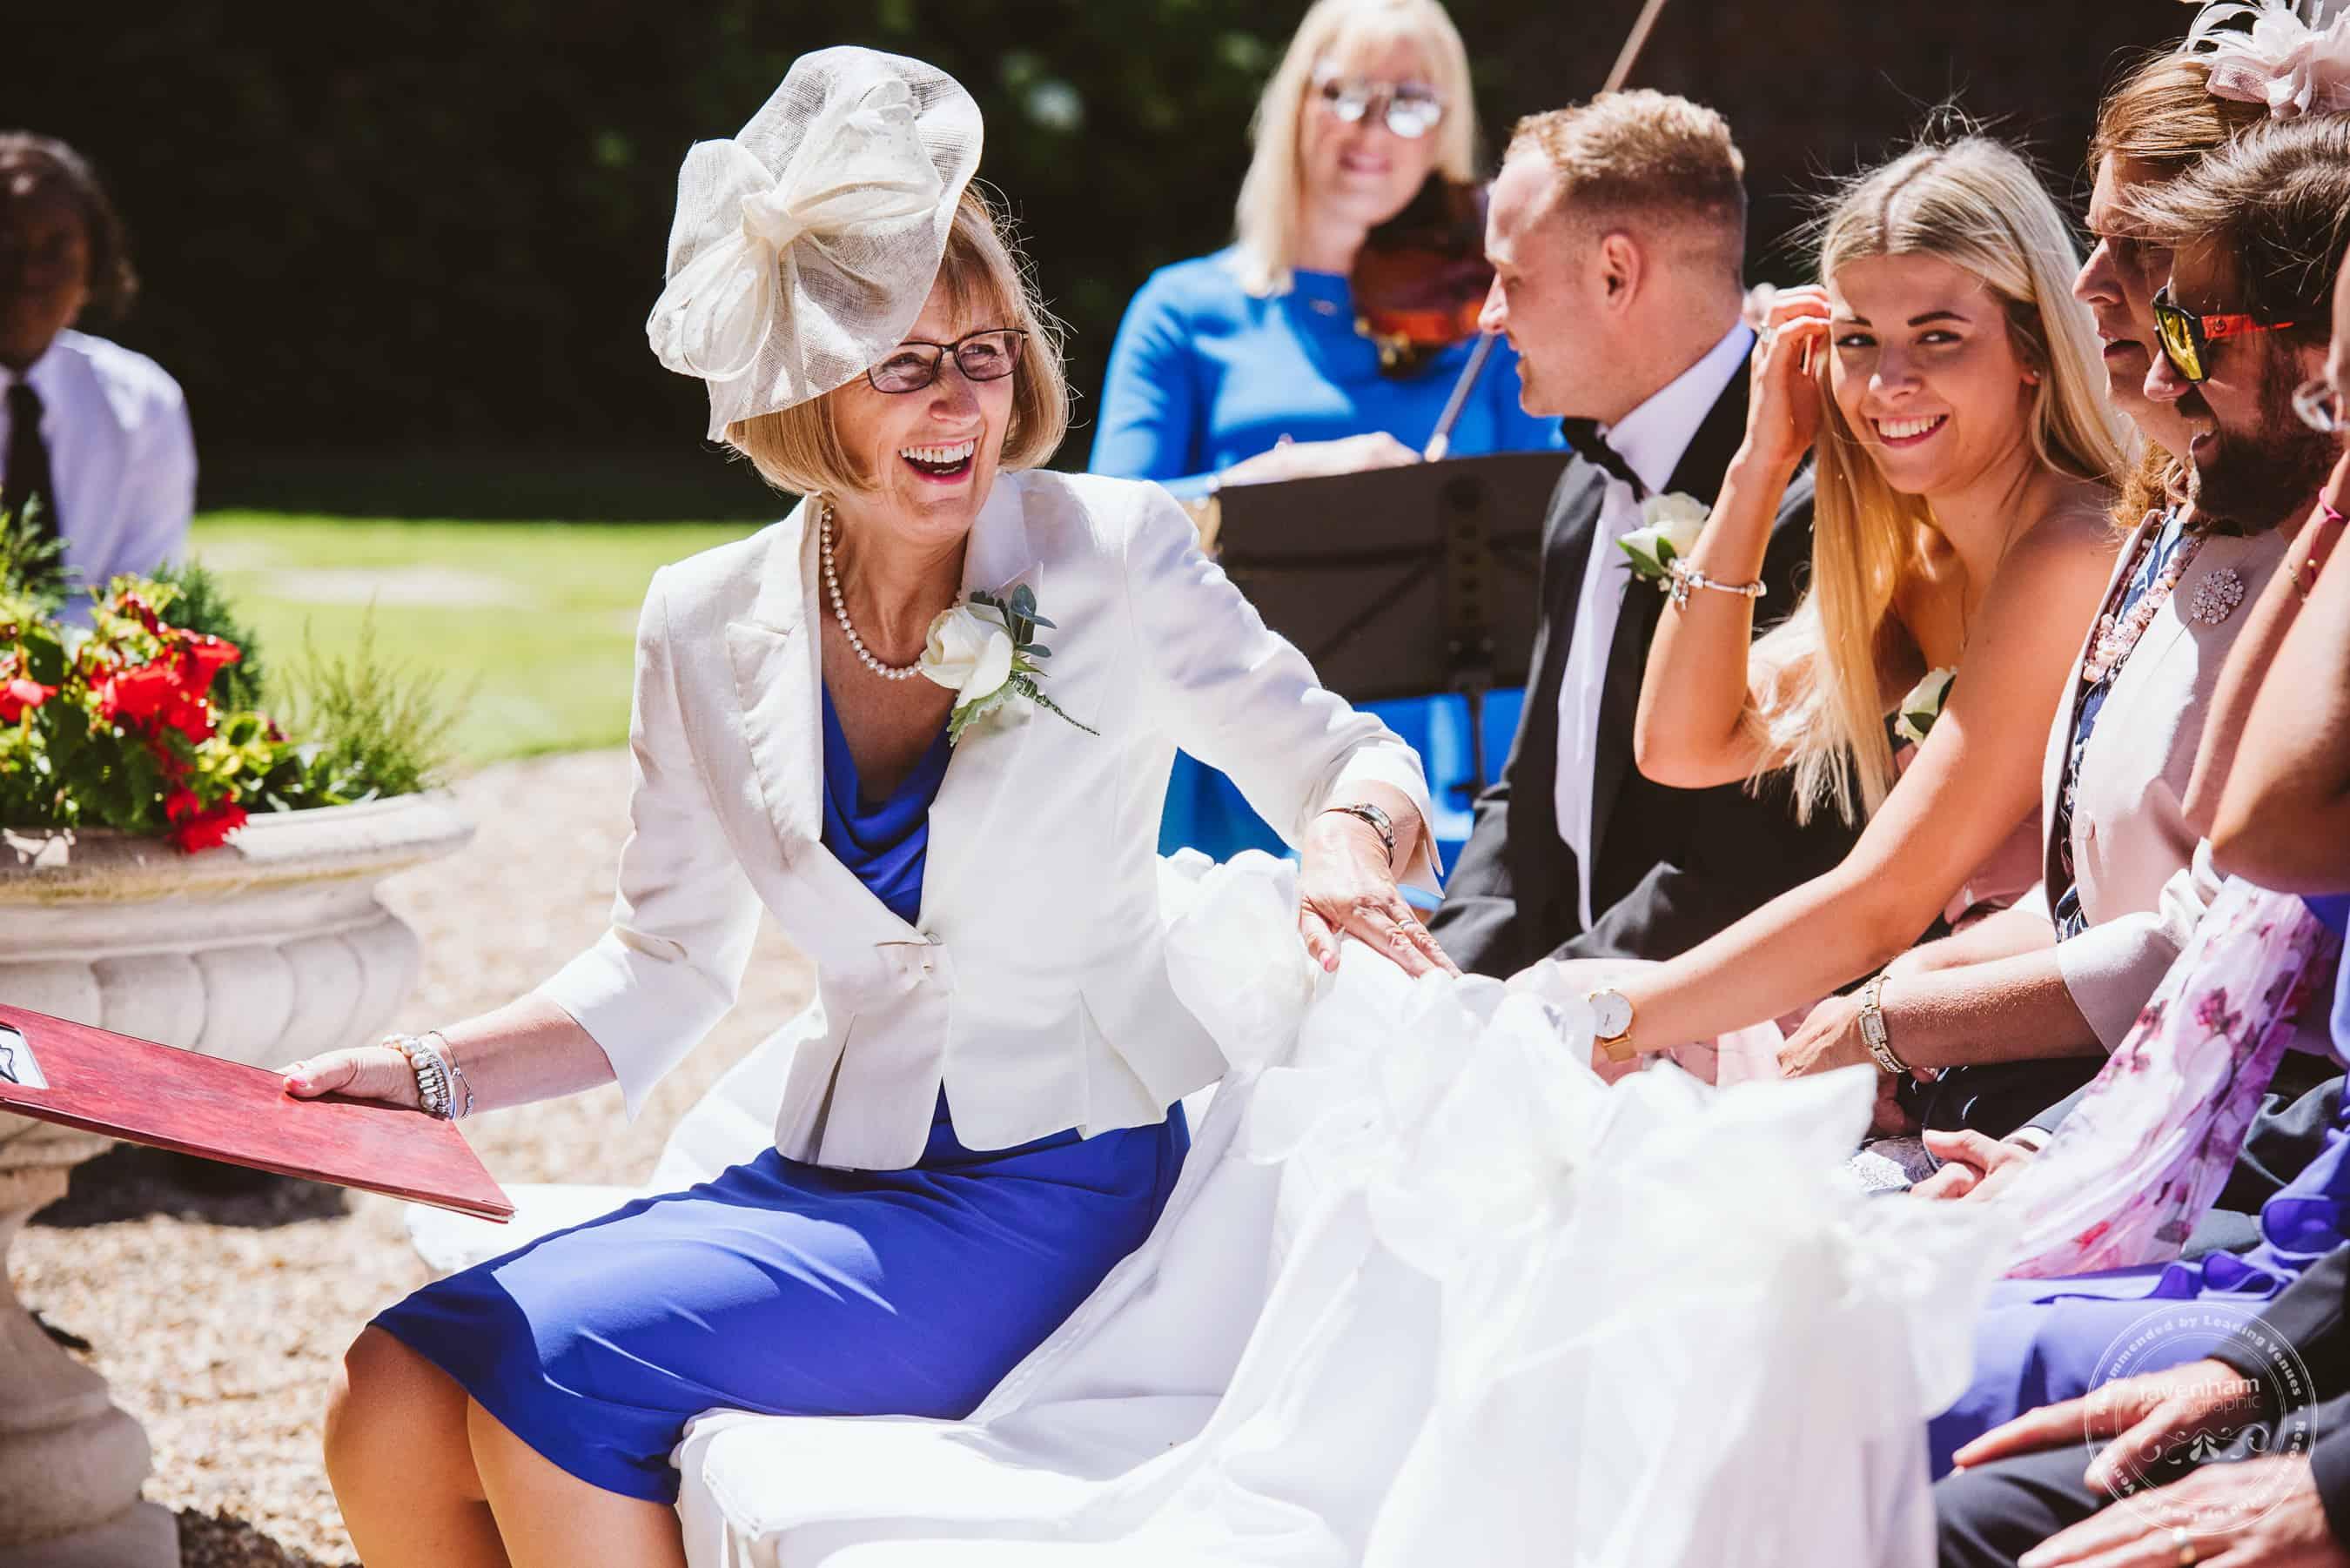 220618 Gosfield Hall Wedding Photography Lavenham Photographic 0061